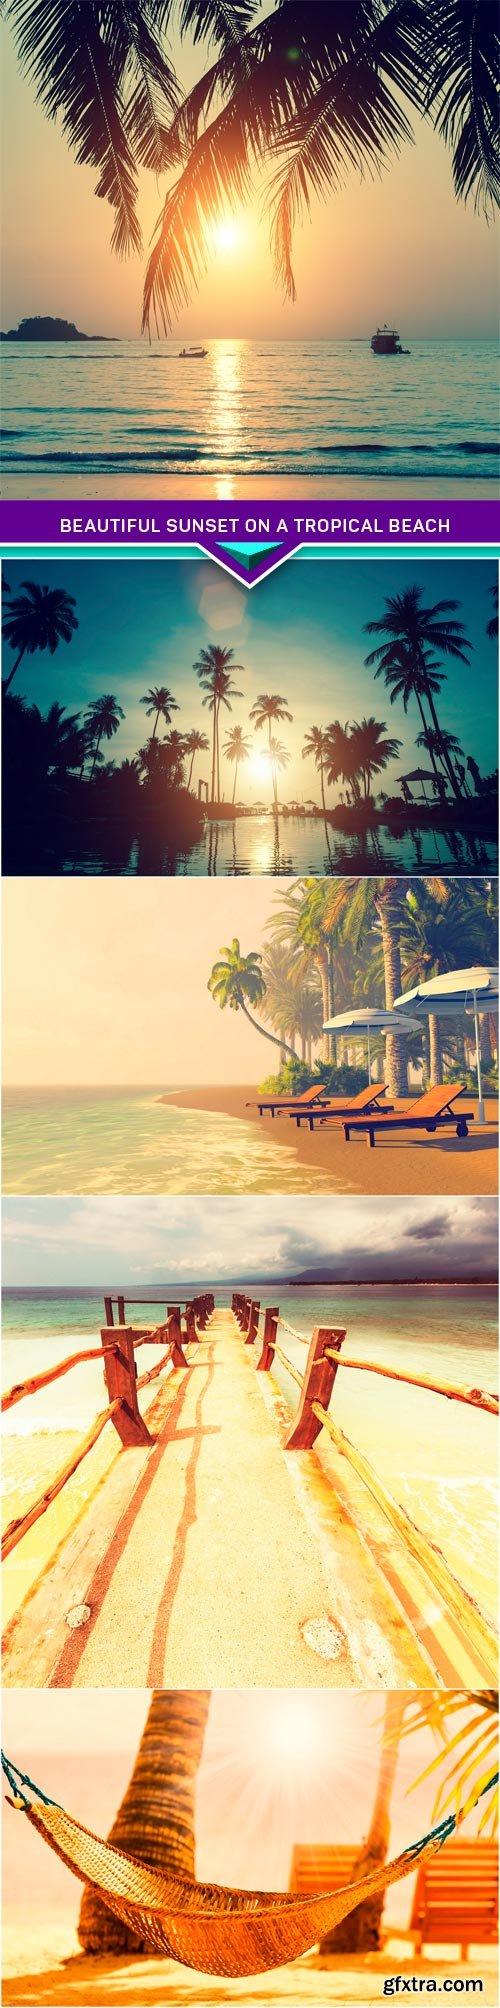 Beautiful sunset on a tropical beach 5X JPEG